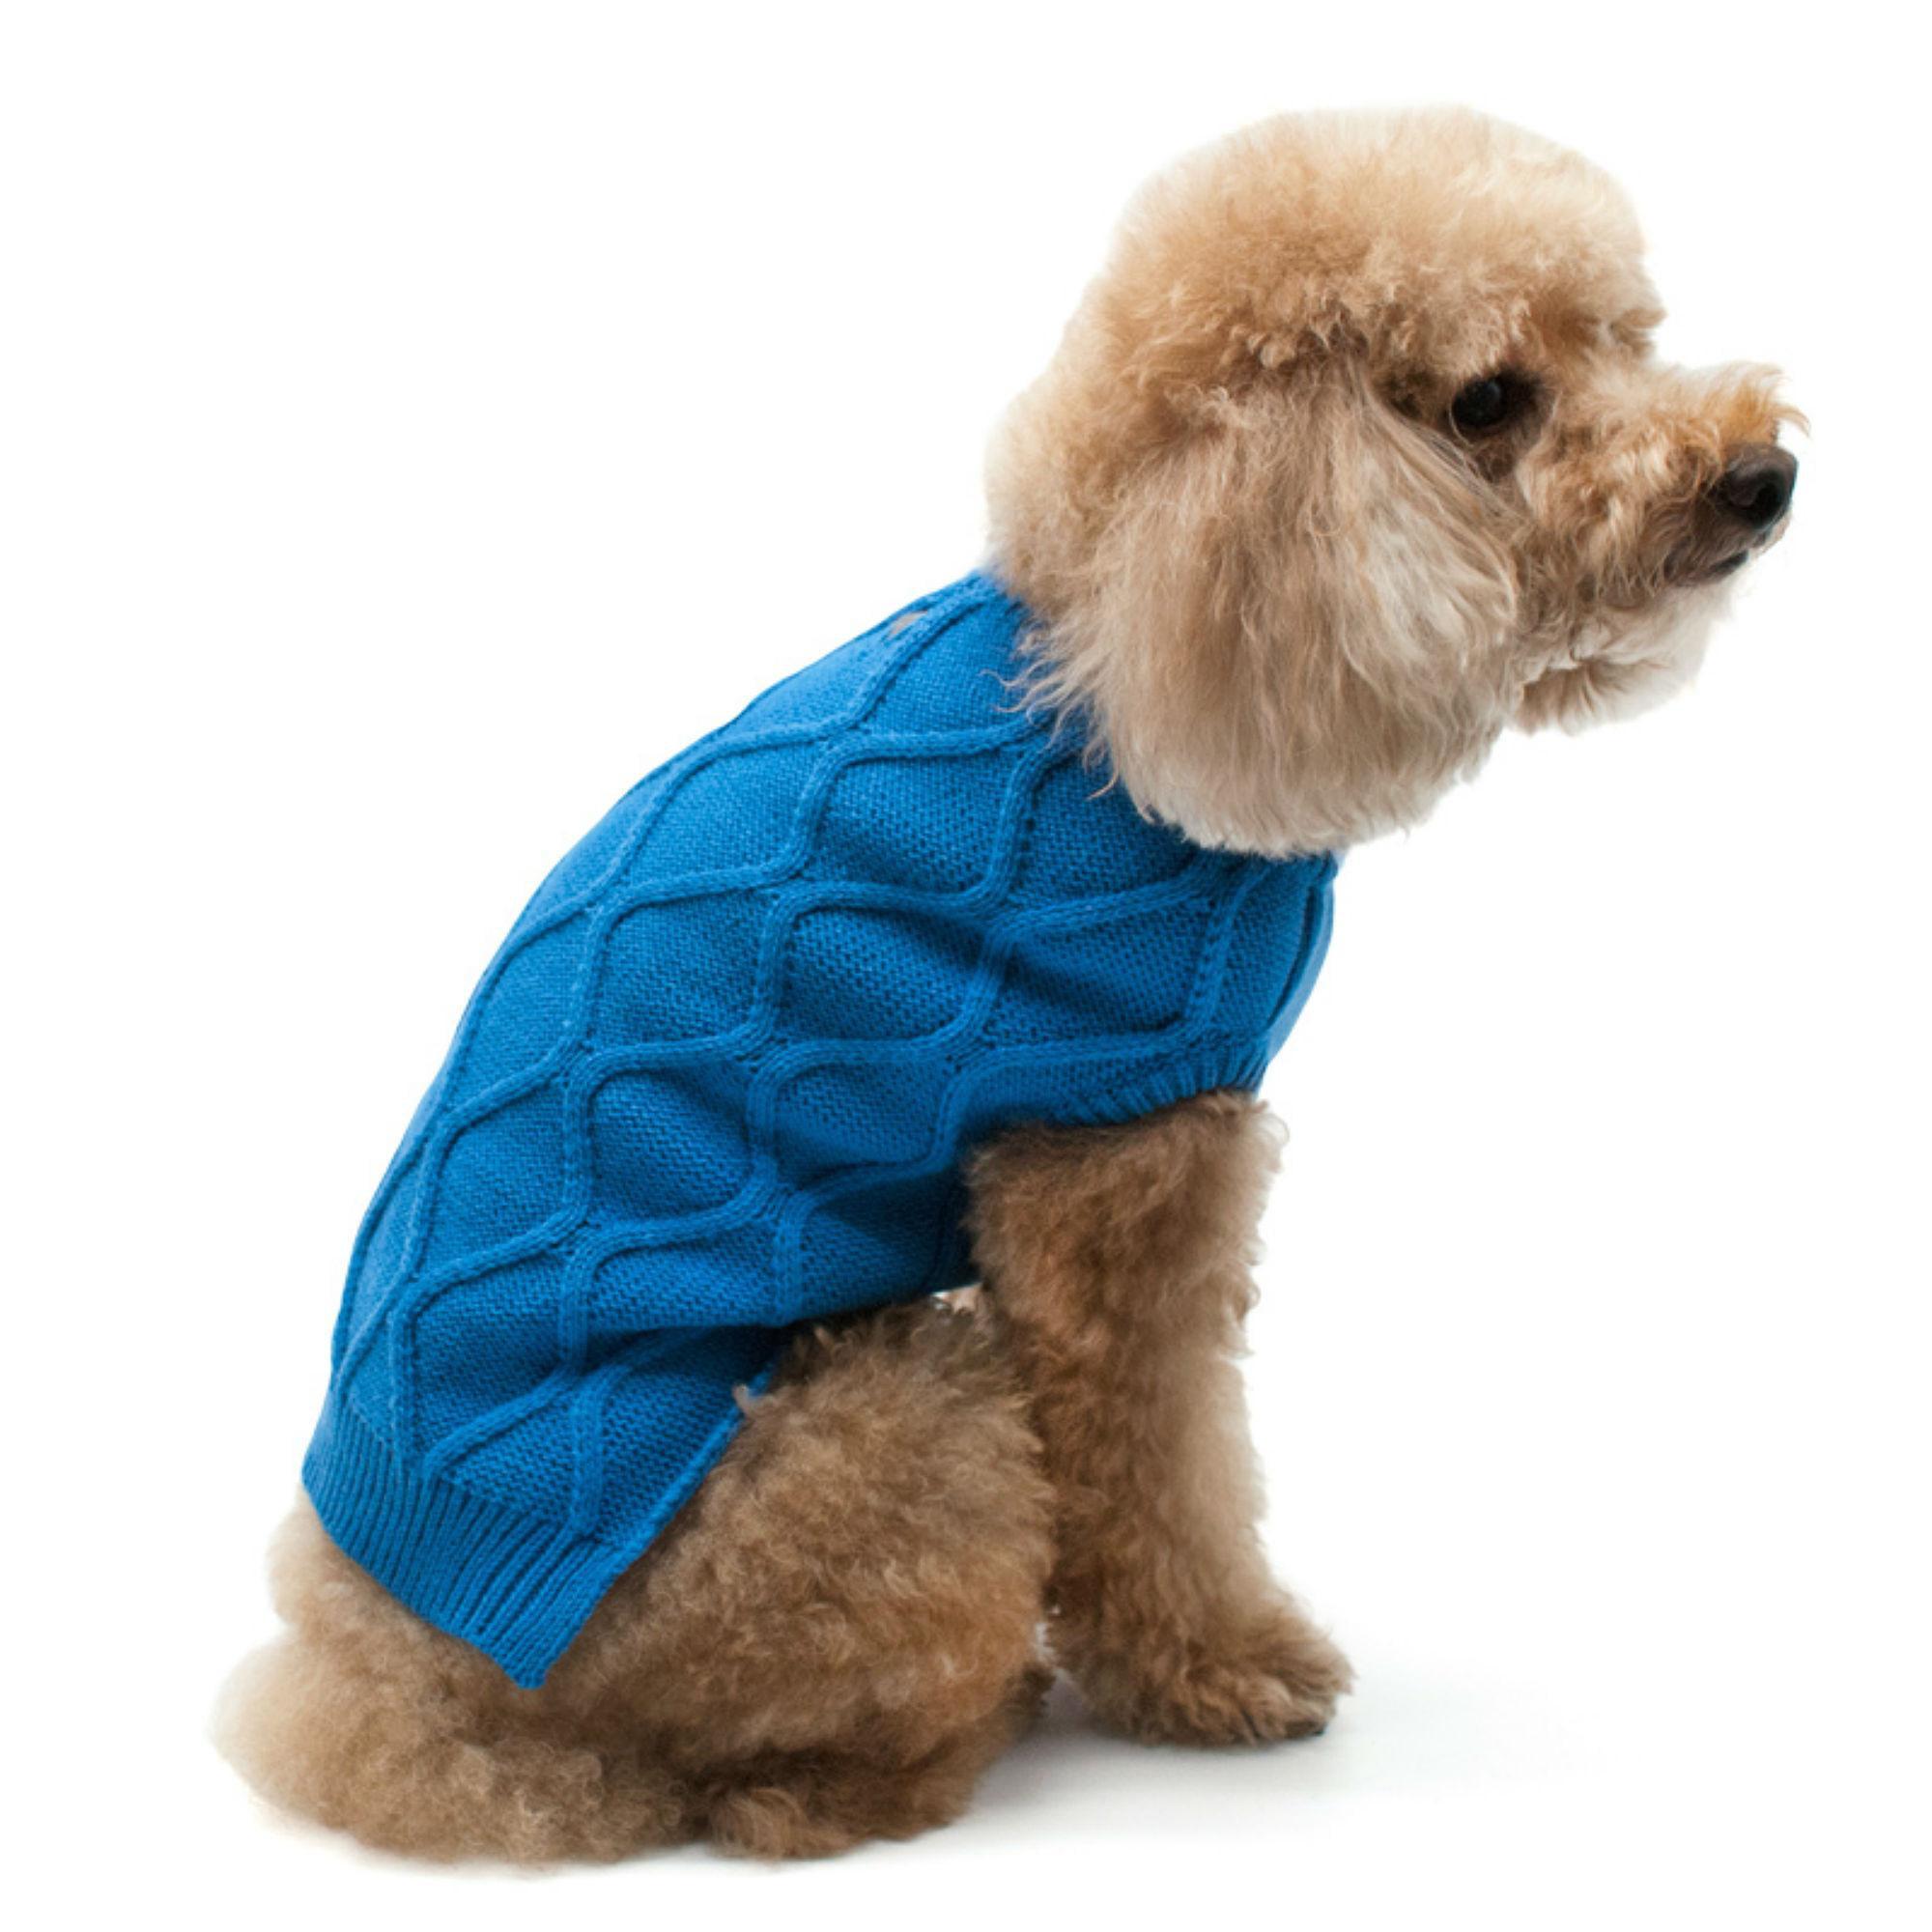 Diamond Knit Dog Sweater By Dogo Blue Large Walmart Com